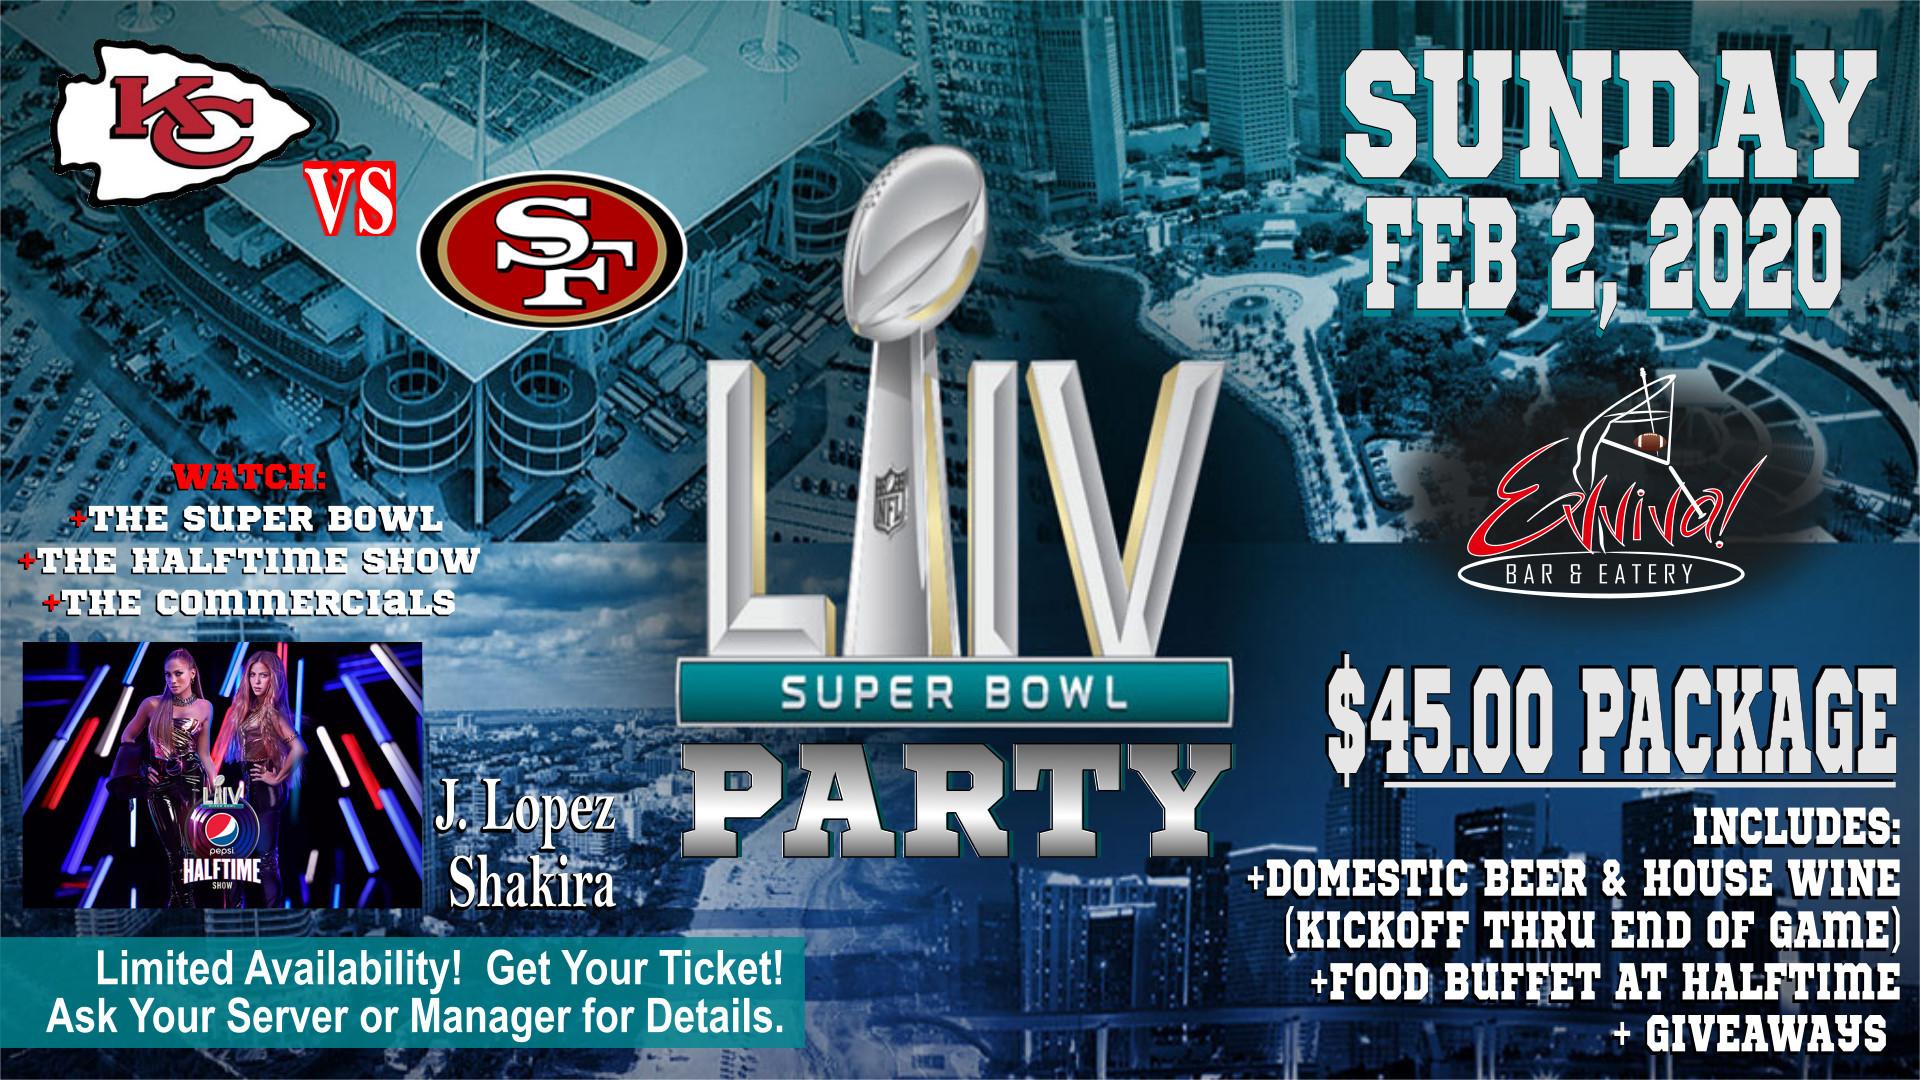 Evviva! Bar & Eatery Super Bowl LIV (54) Party @ Evviva! Bar & Eatery